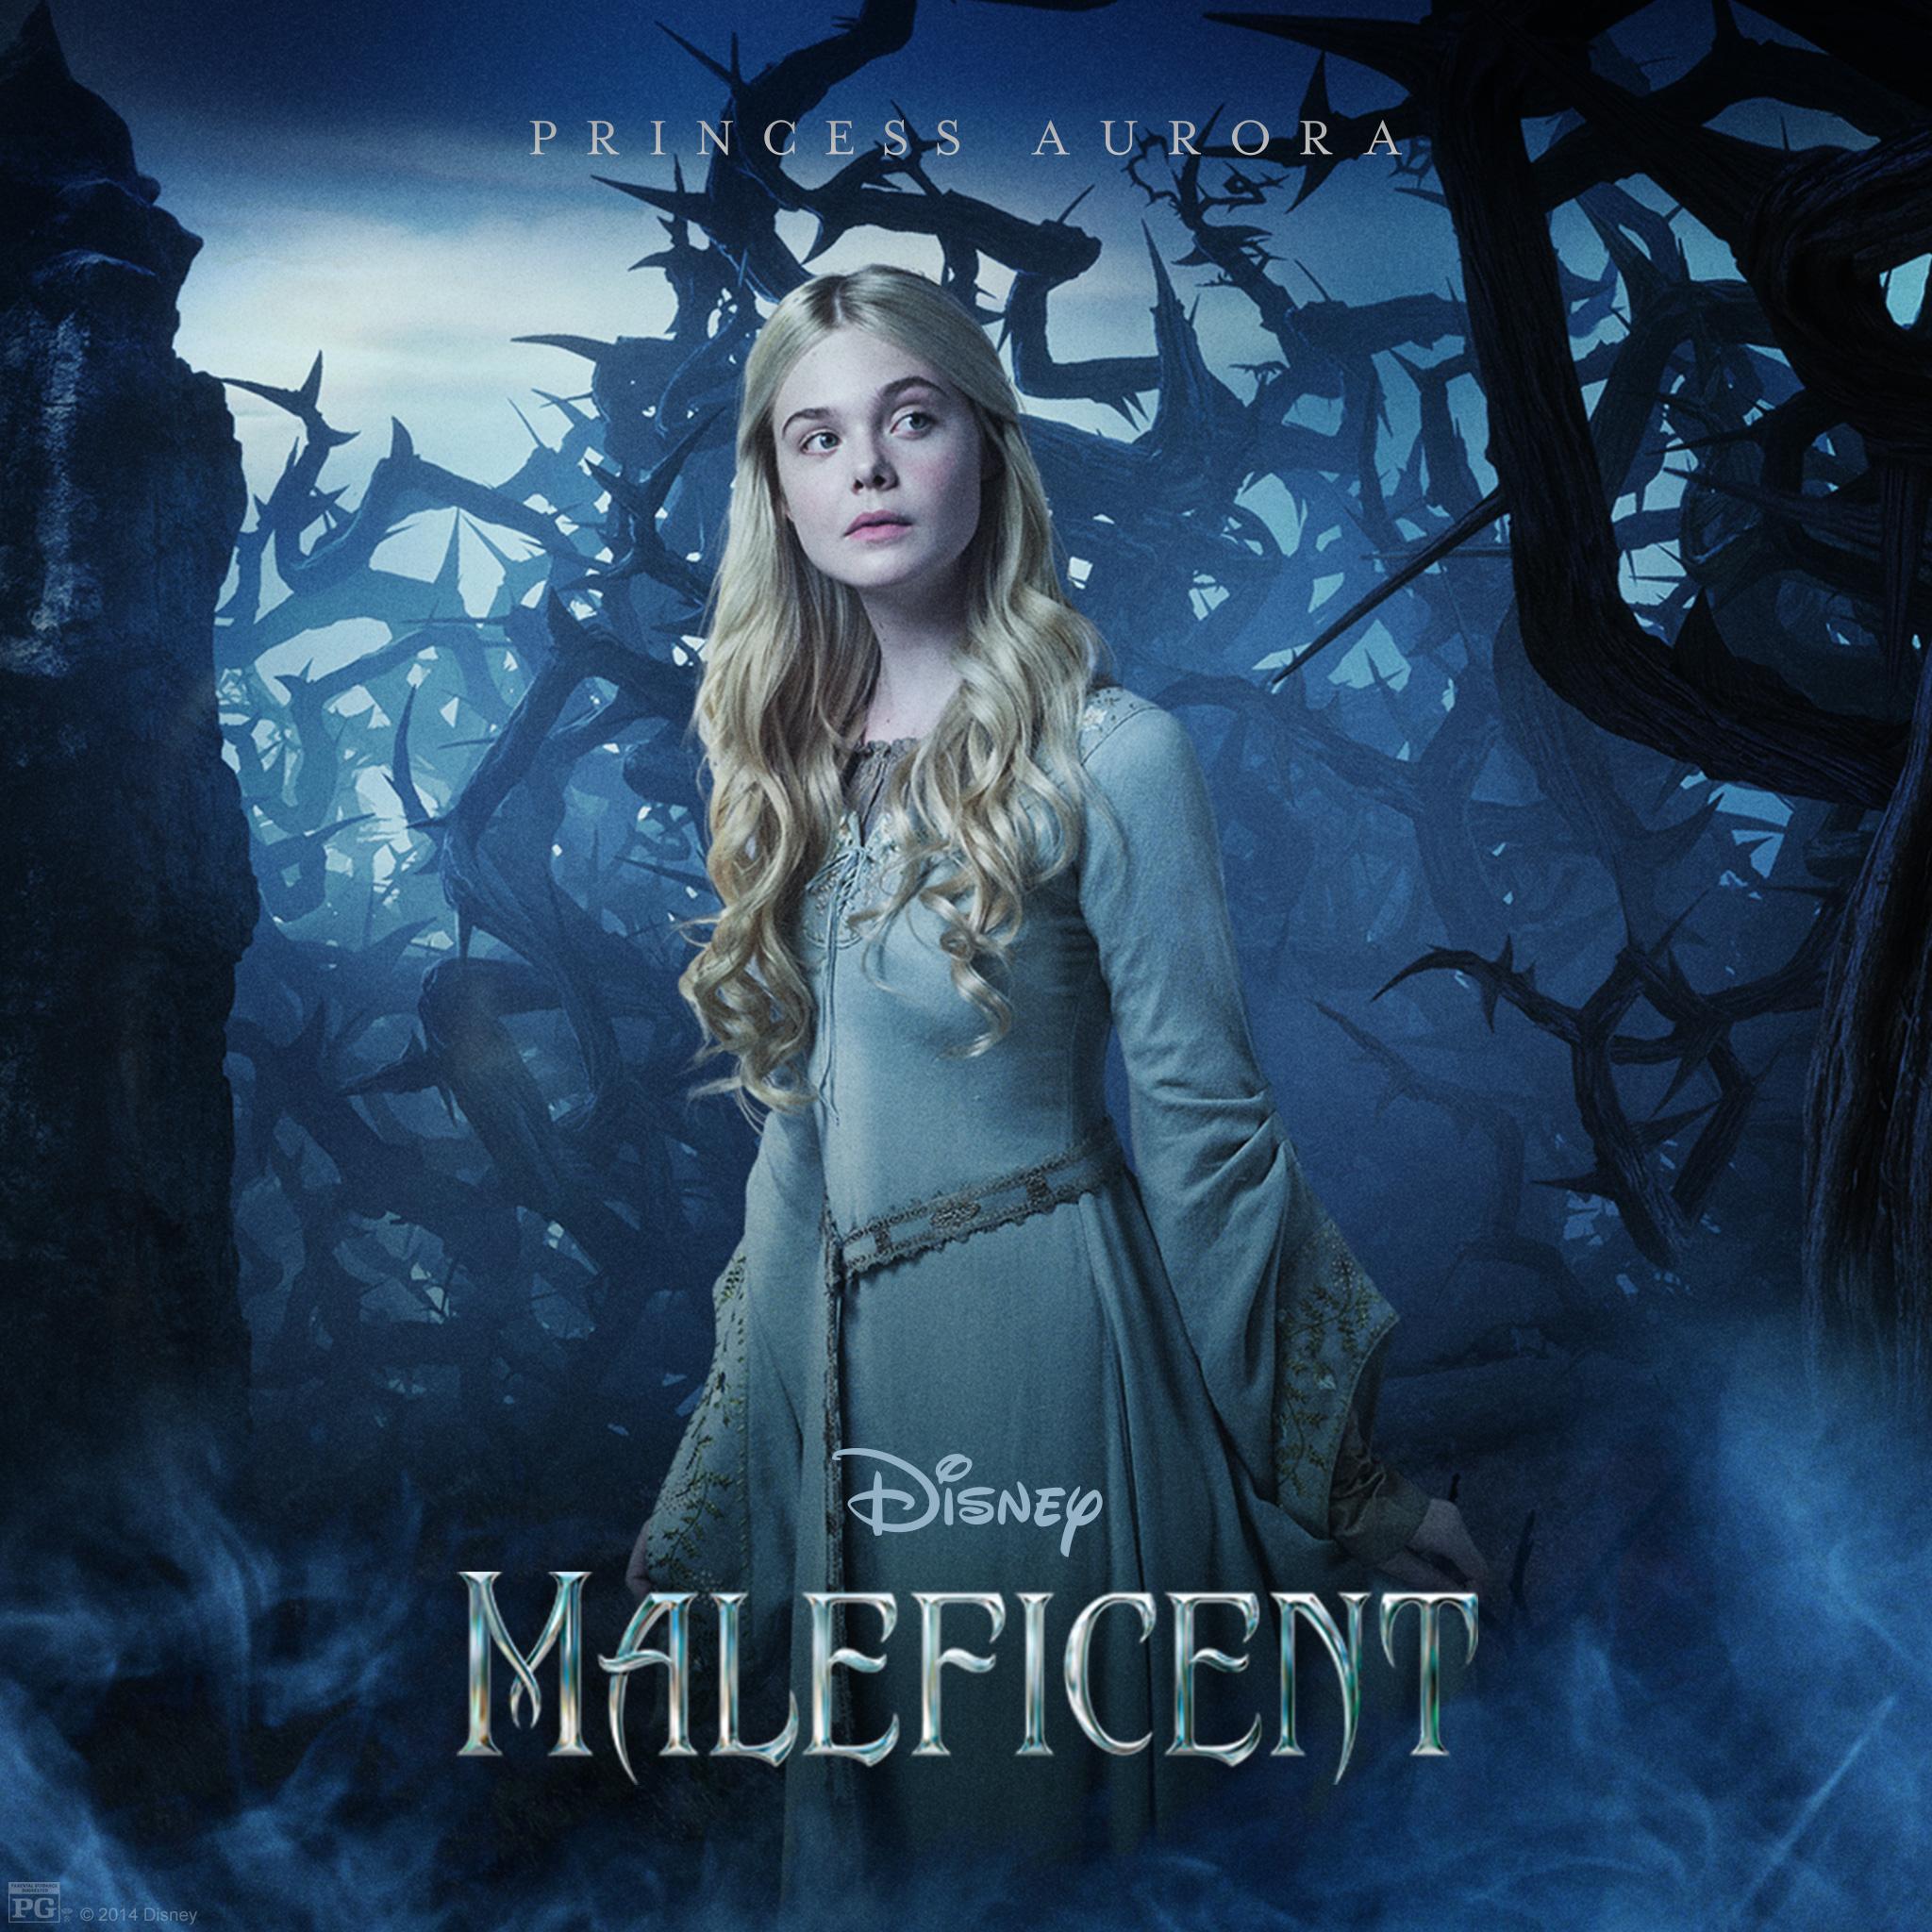 Princess Aurora Tablet Wallpaper - Maleficent (2014) Photo ...